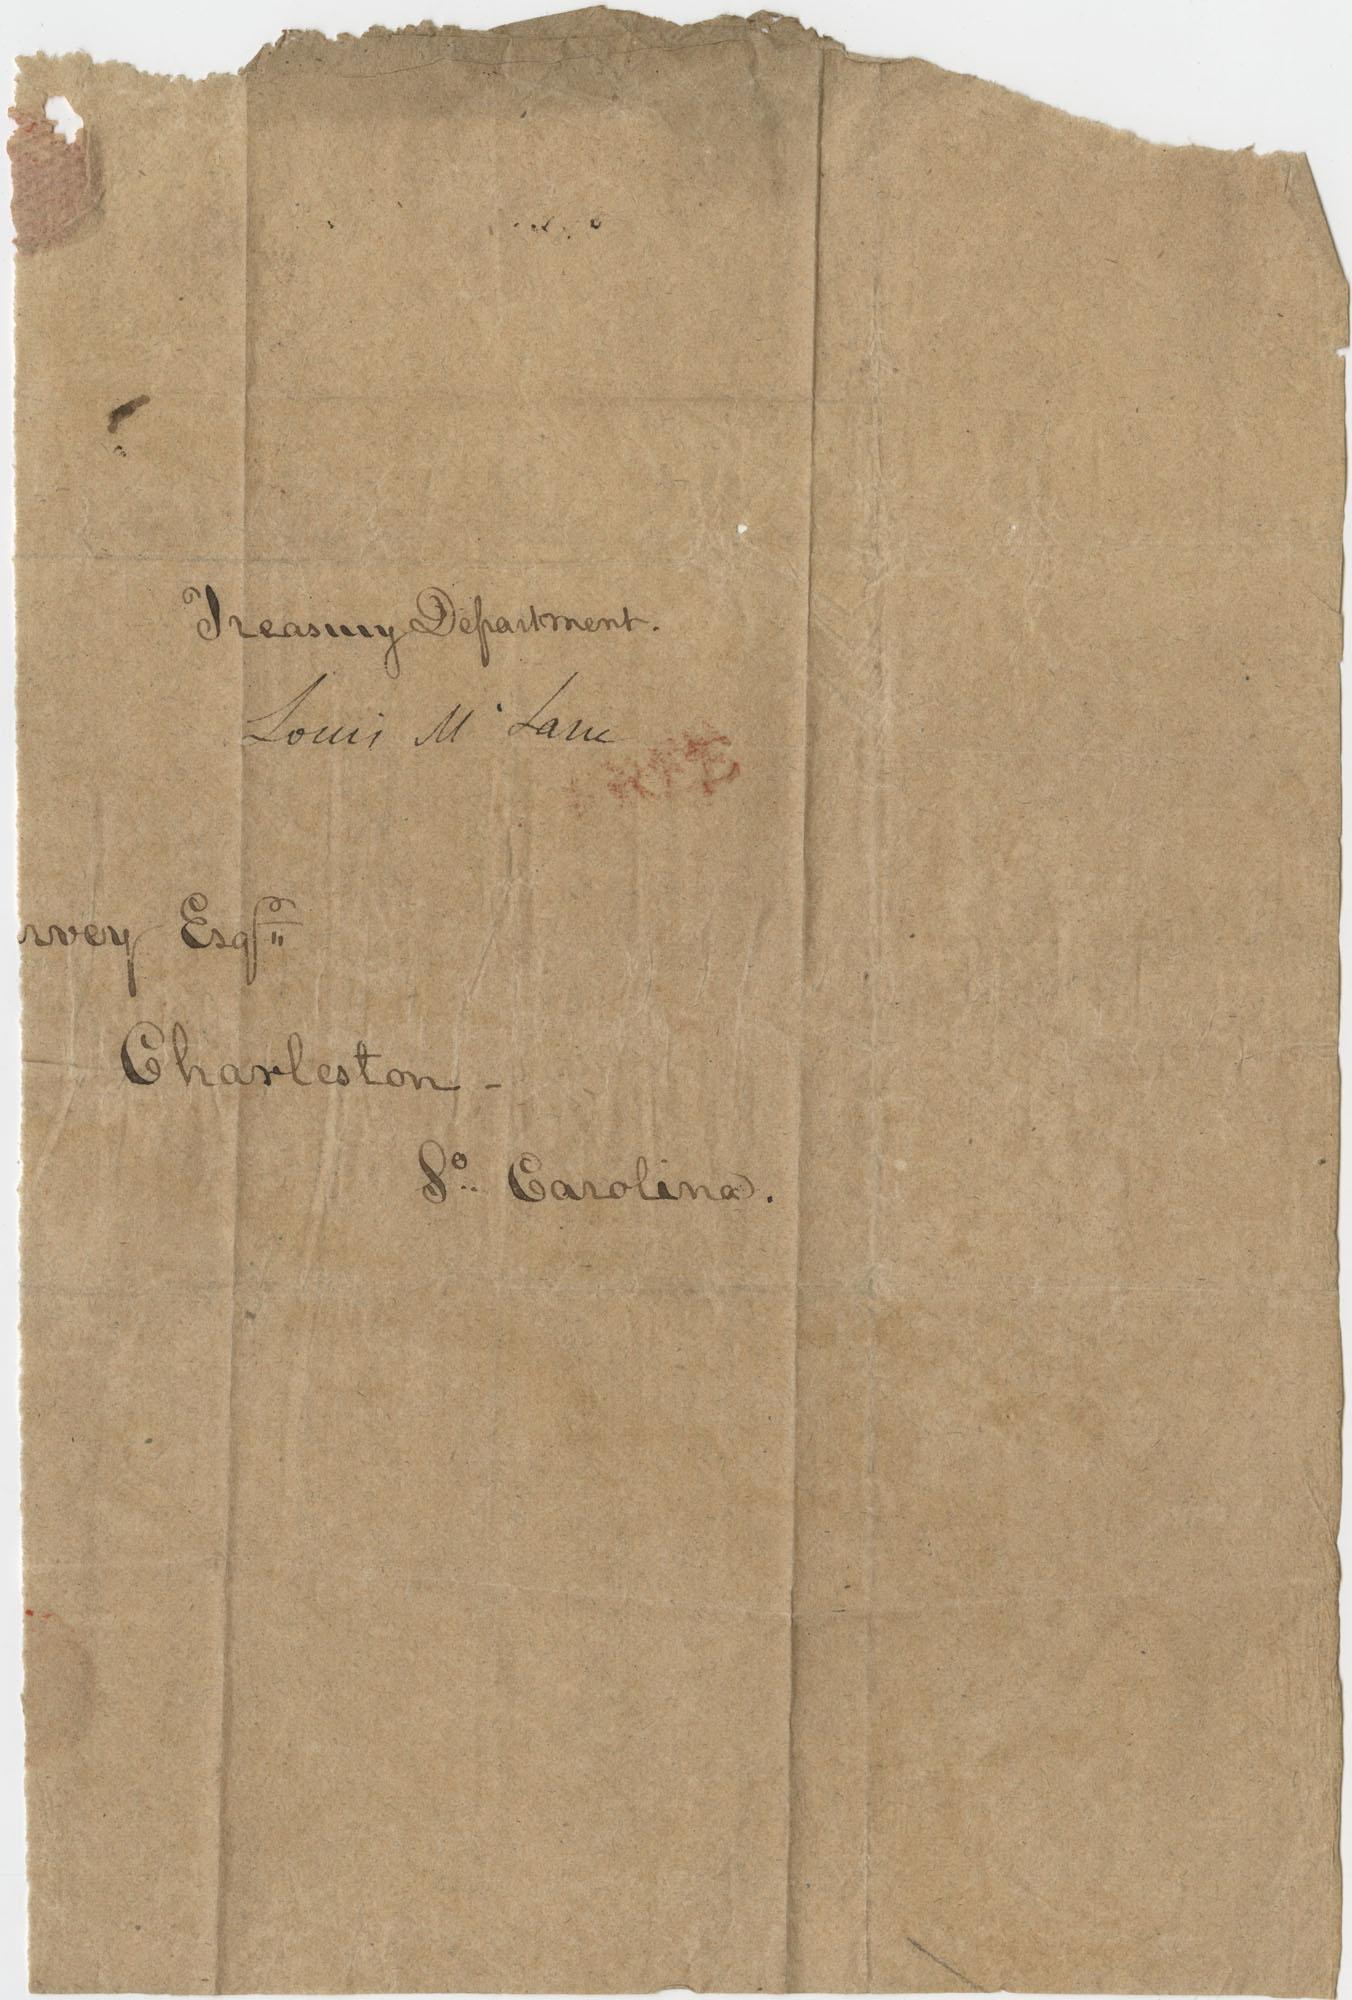 Thomas S. Grimke Autograph Collection, Autograph of Louis McLane (1786-1857), United States Secretary of the Treasury 1833-1834